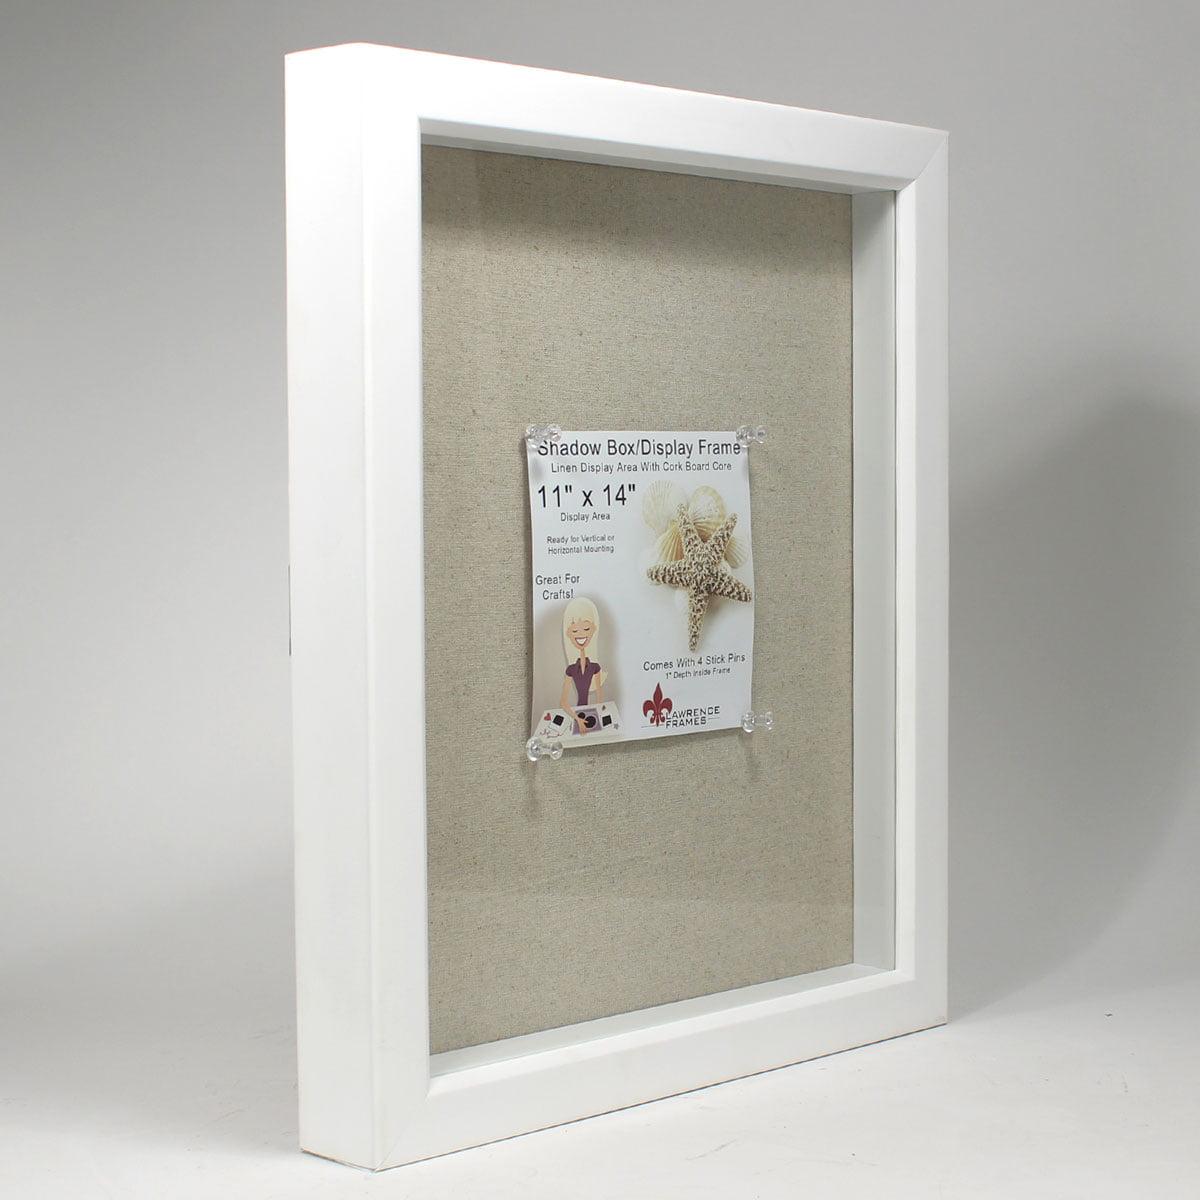 11x14 white shadow box frame linen inner display board walmartcom - White Shadow Box Frame